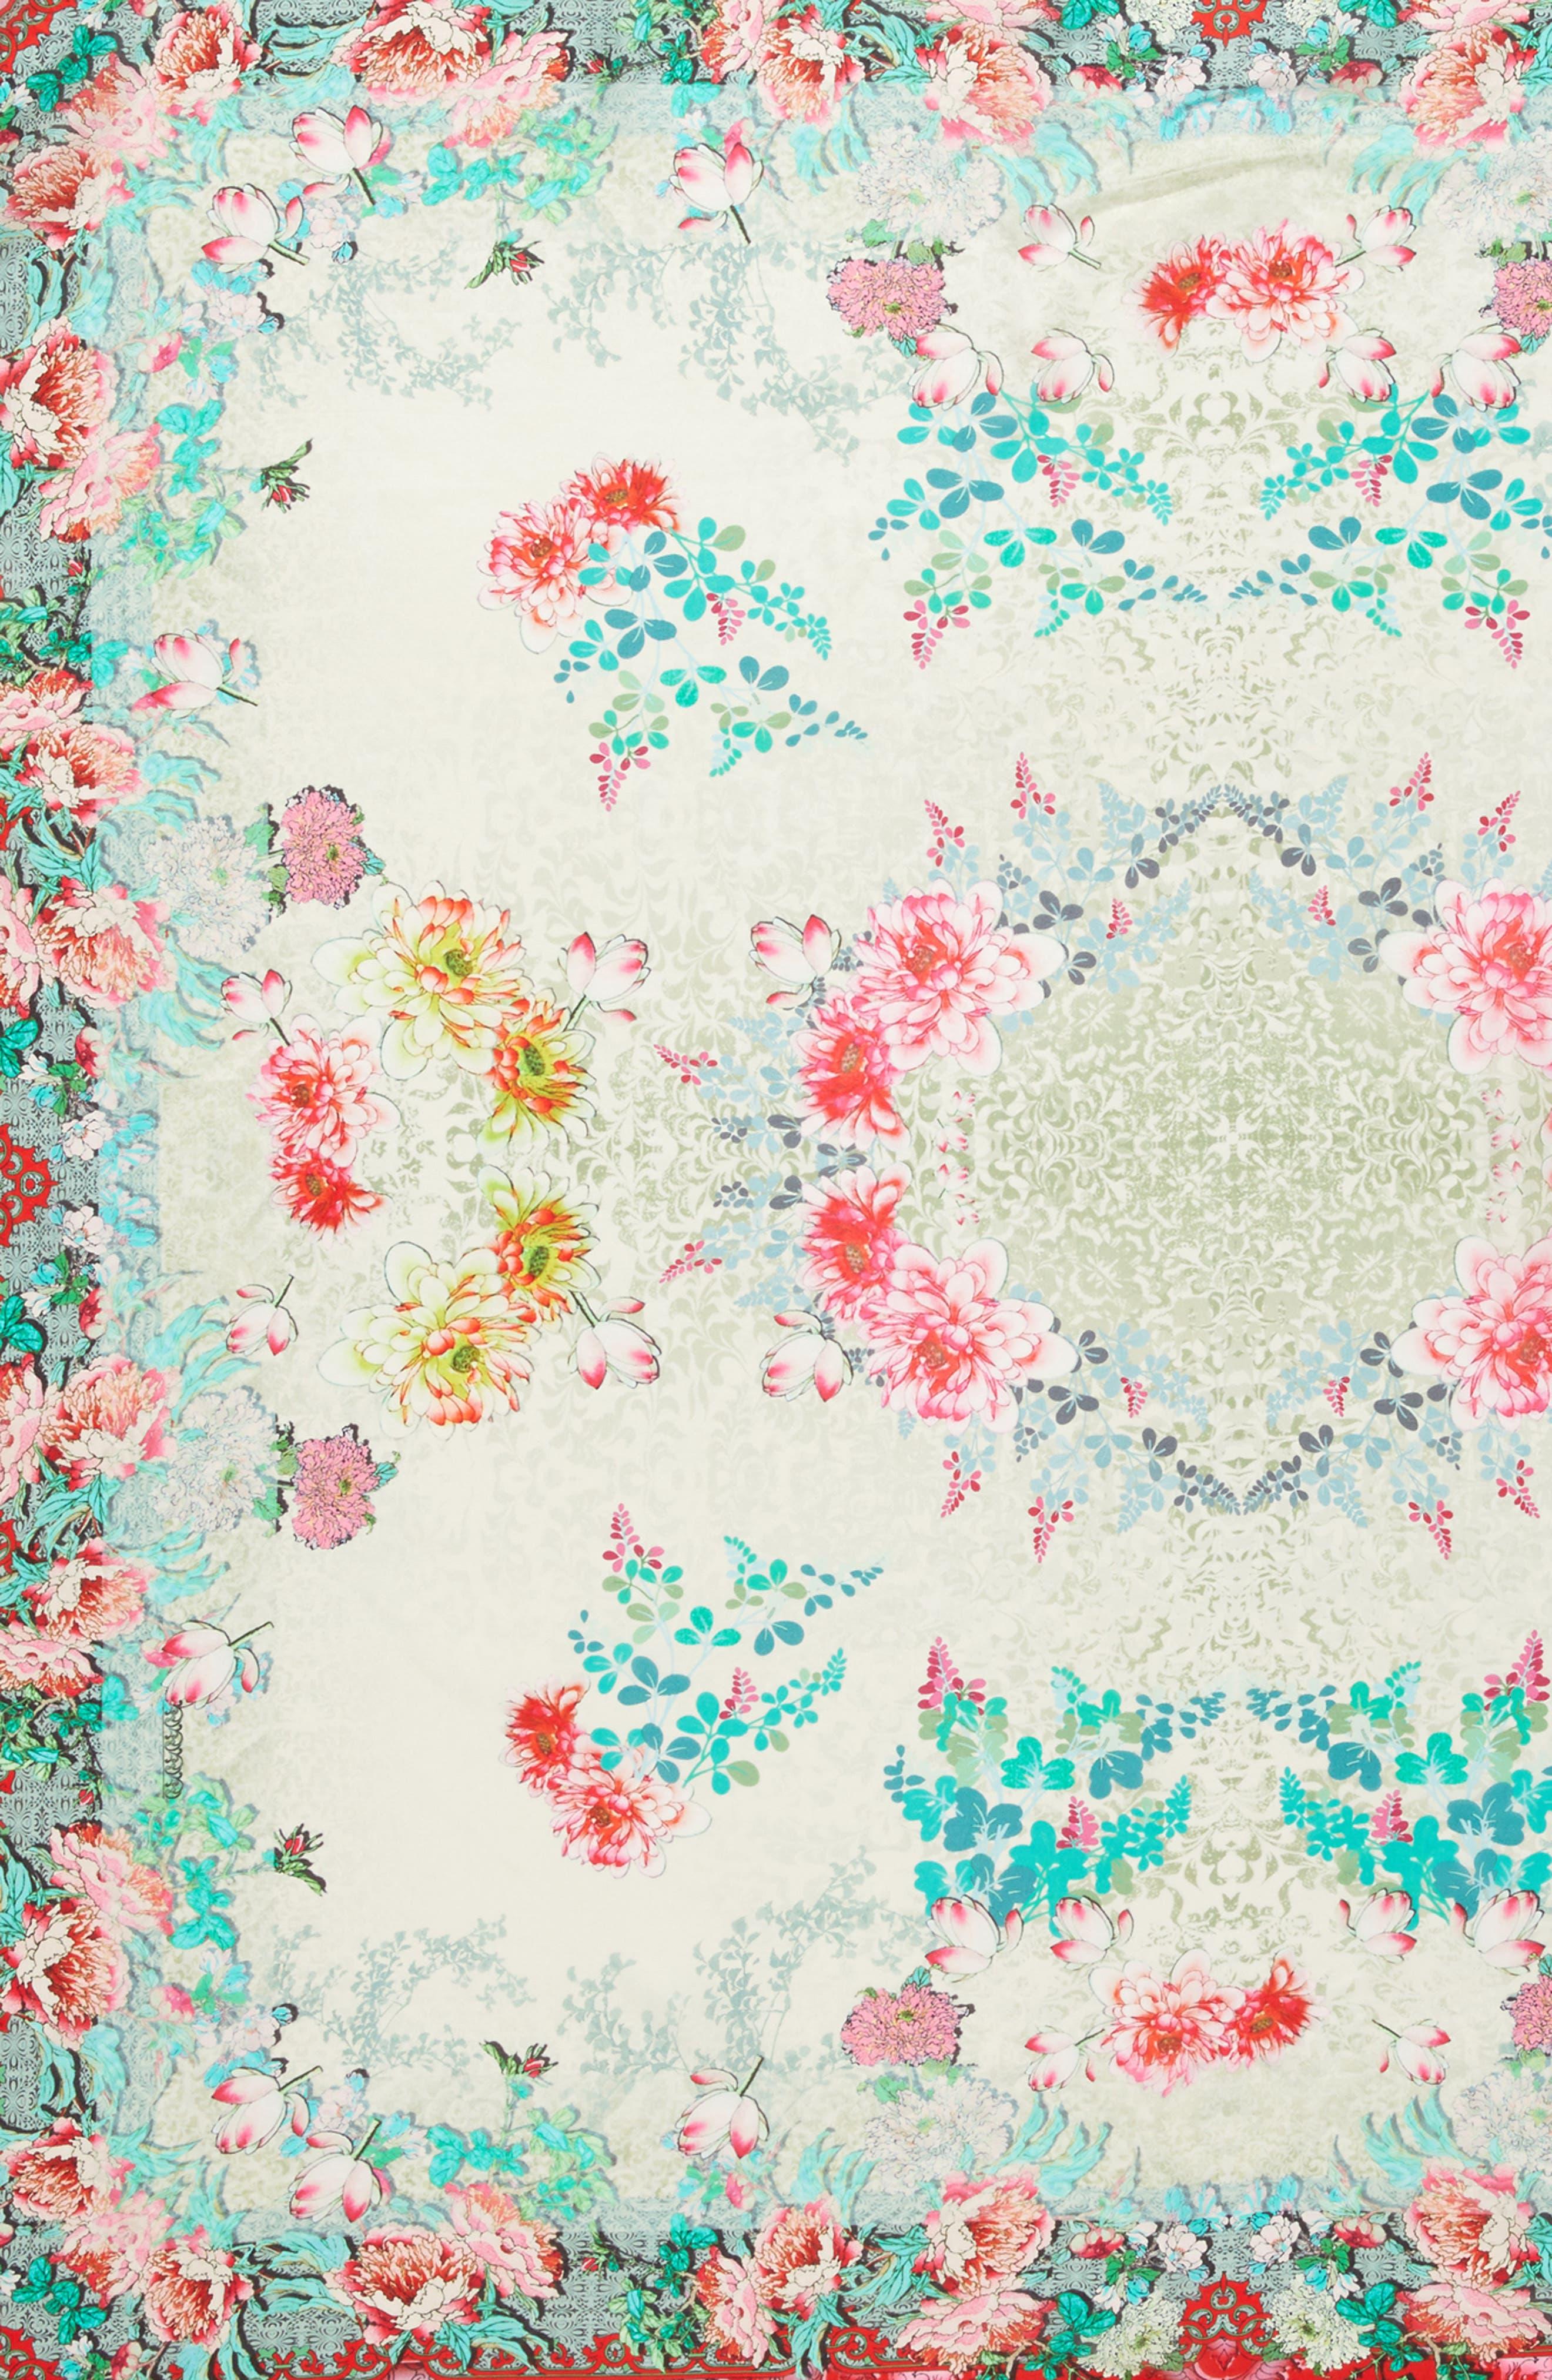 Whisper Silk Square Scarf,                             Alternate thumbnail 4, color,                             600